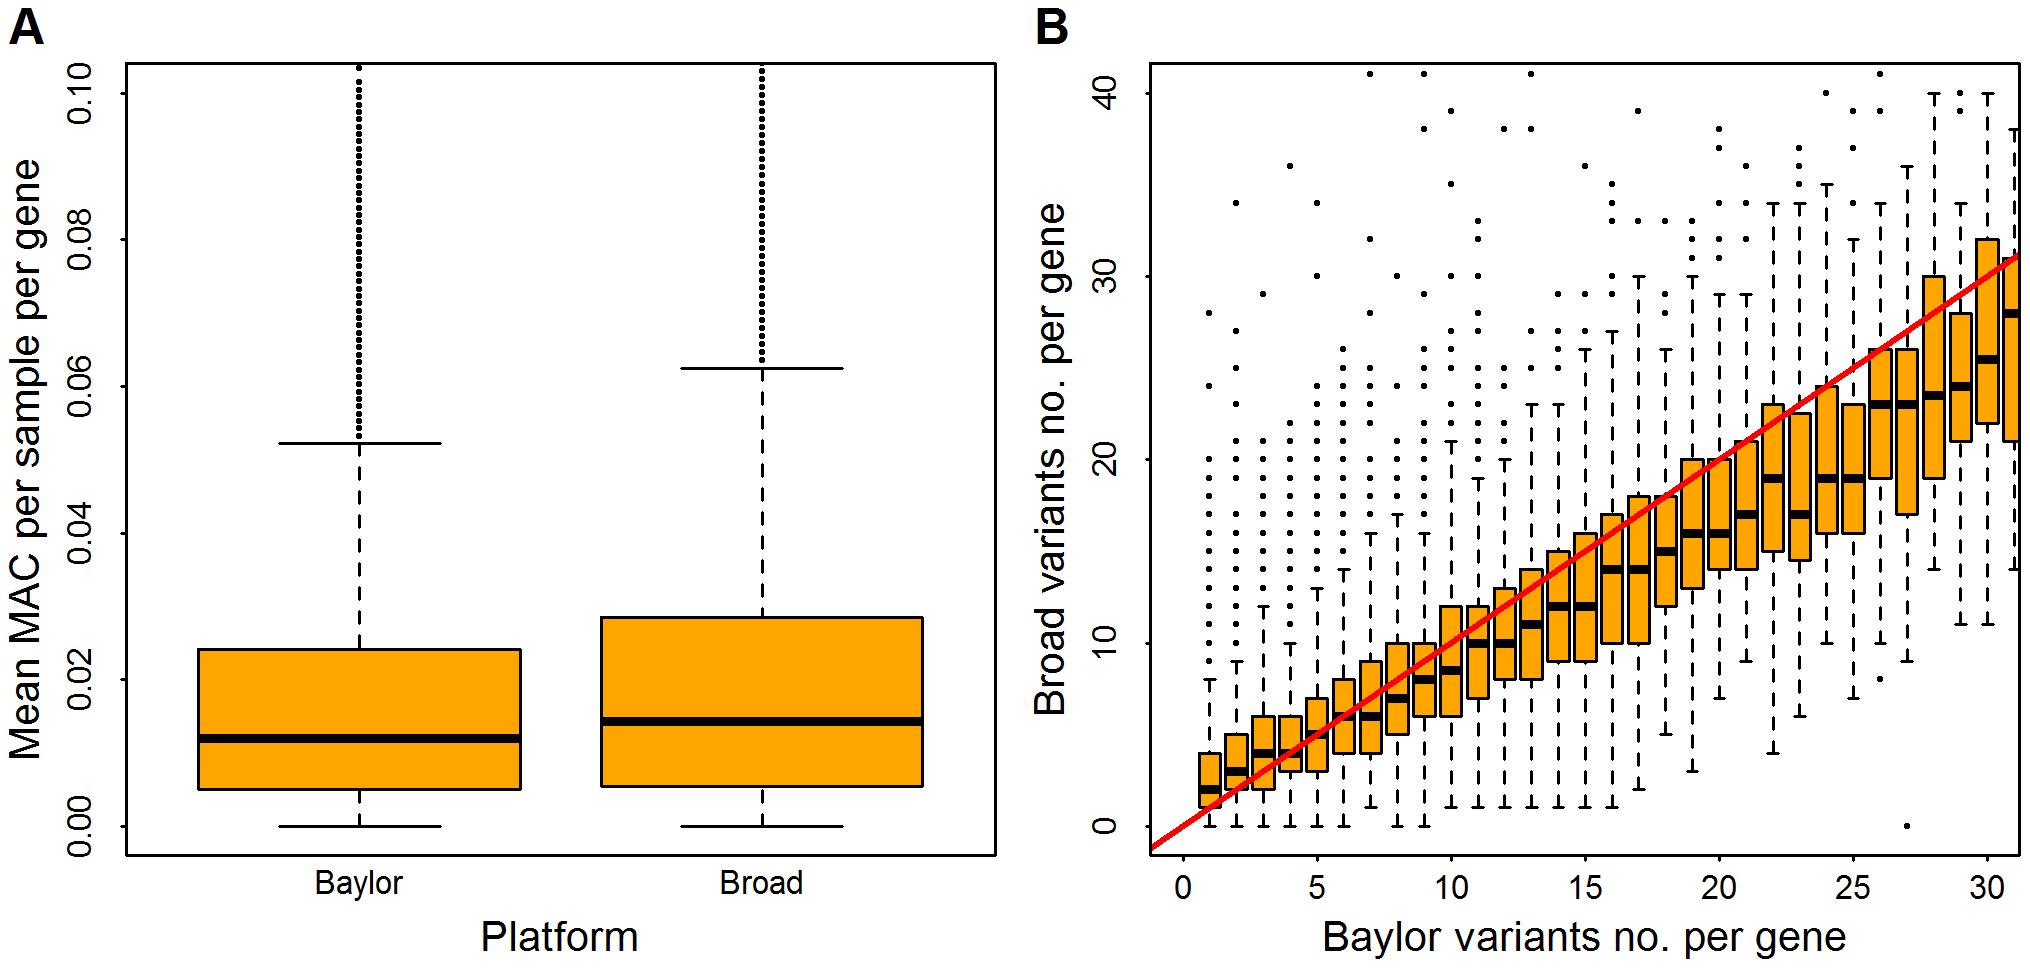 Distribution of rare variants per gene in Baylor and Broad data sets after filtering.